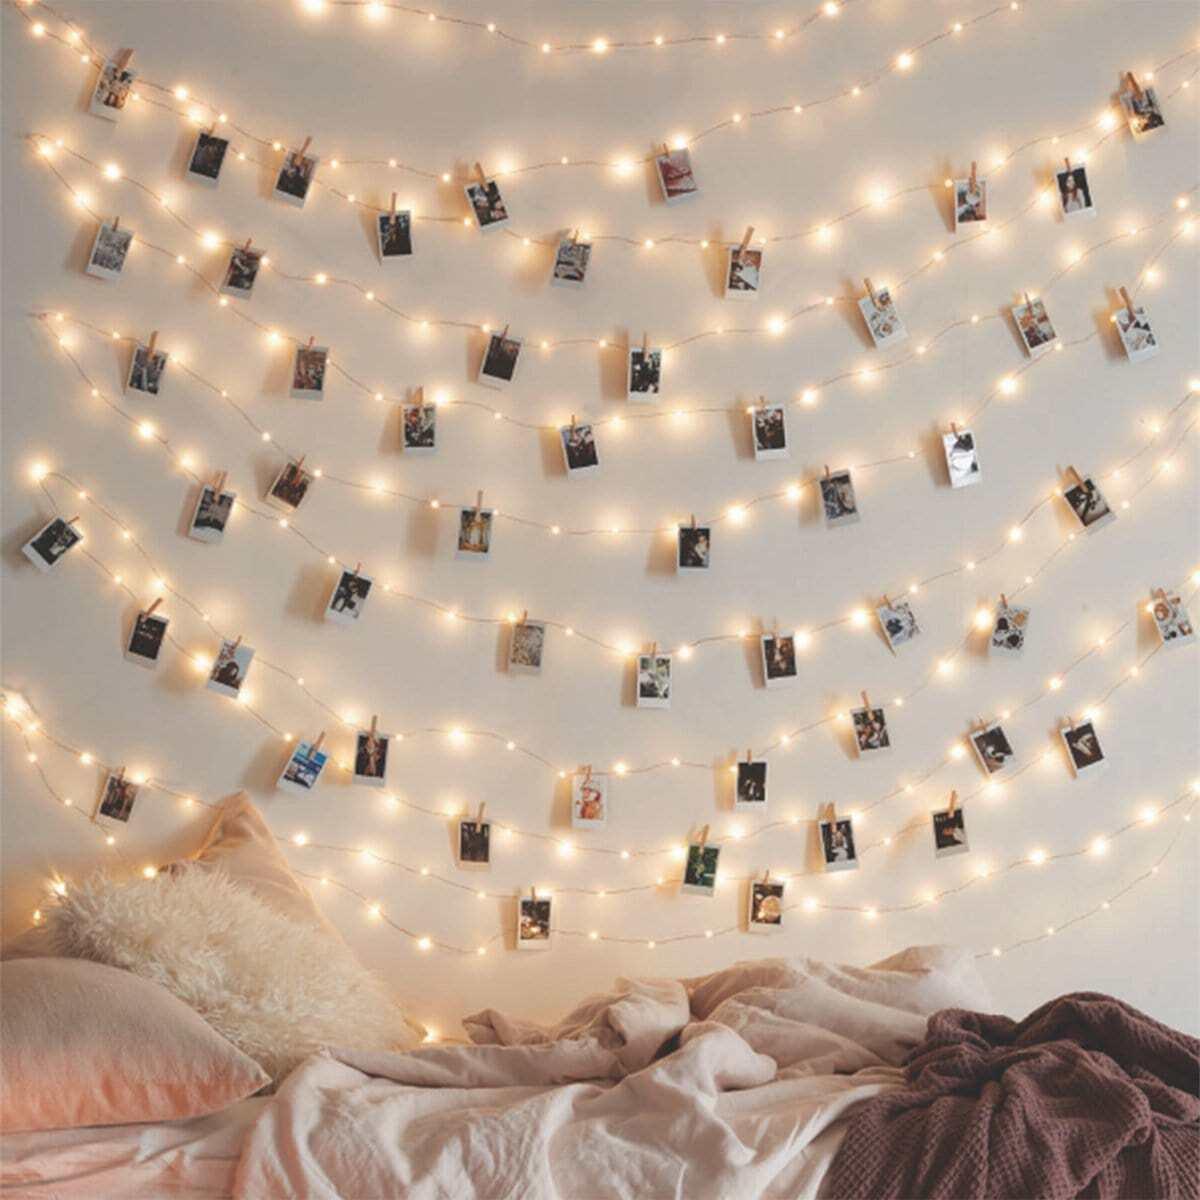 Mini lichtsnoer met gloeilampjes